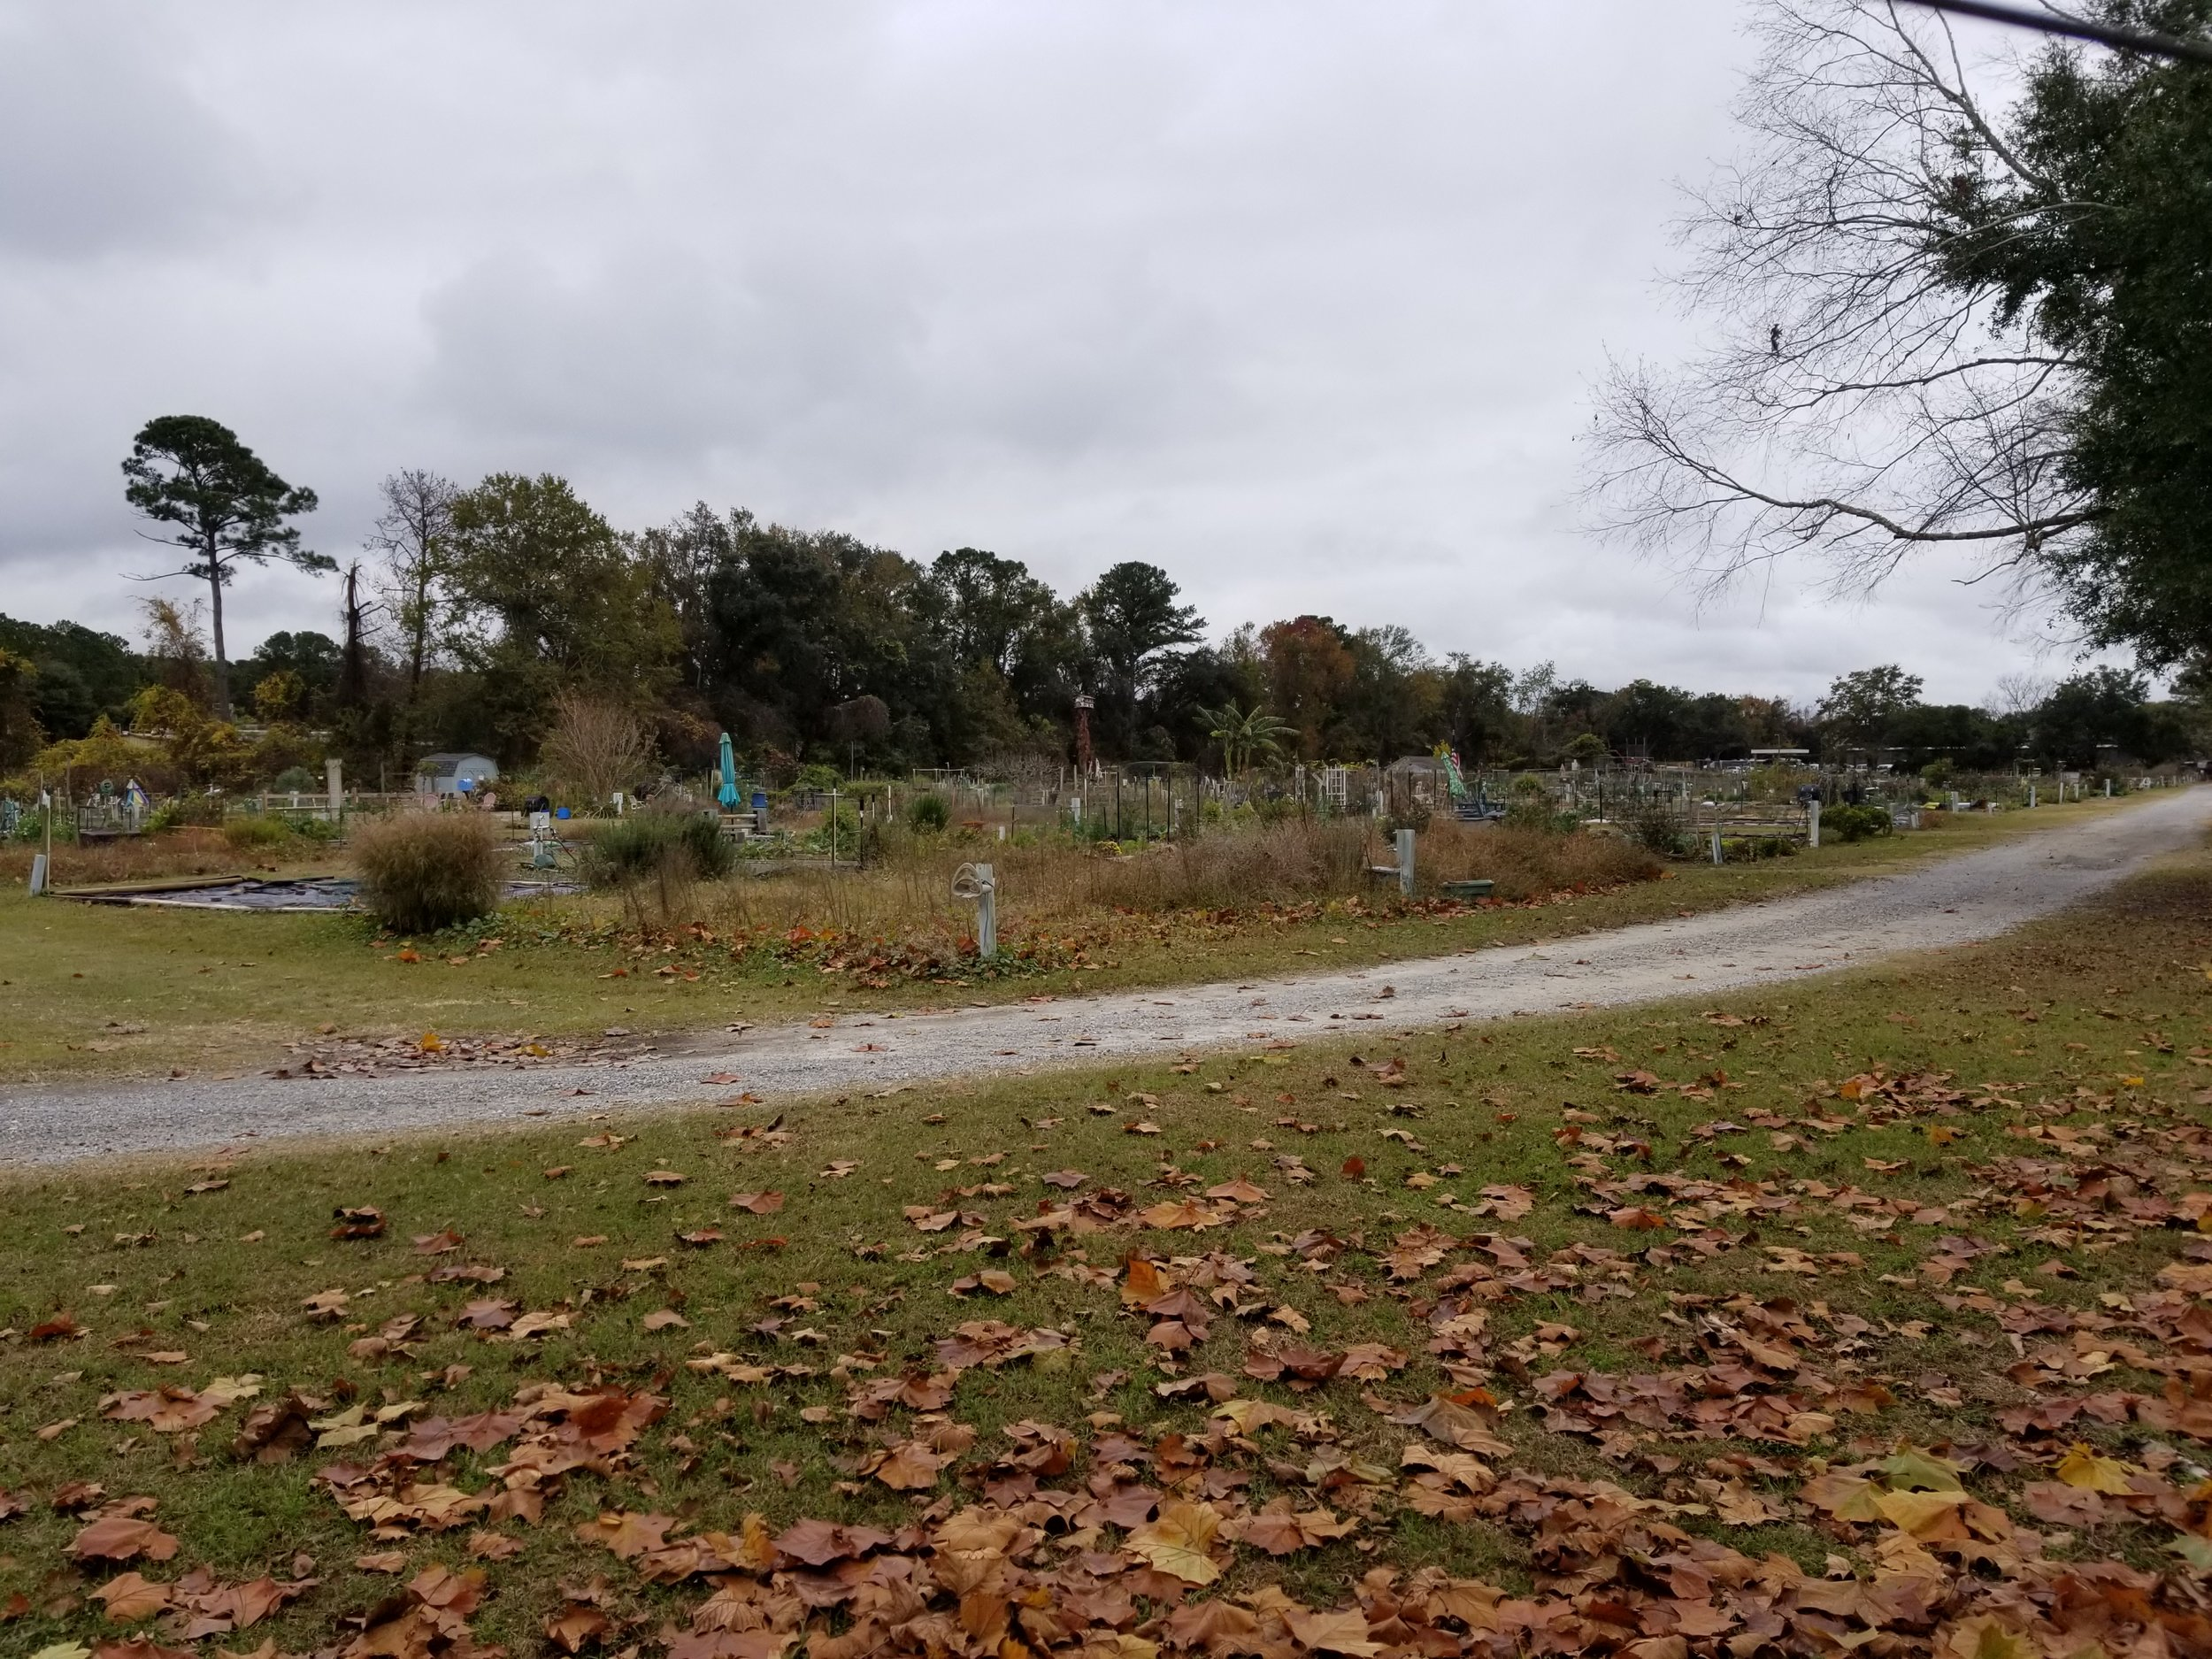 Seabrook Farm